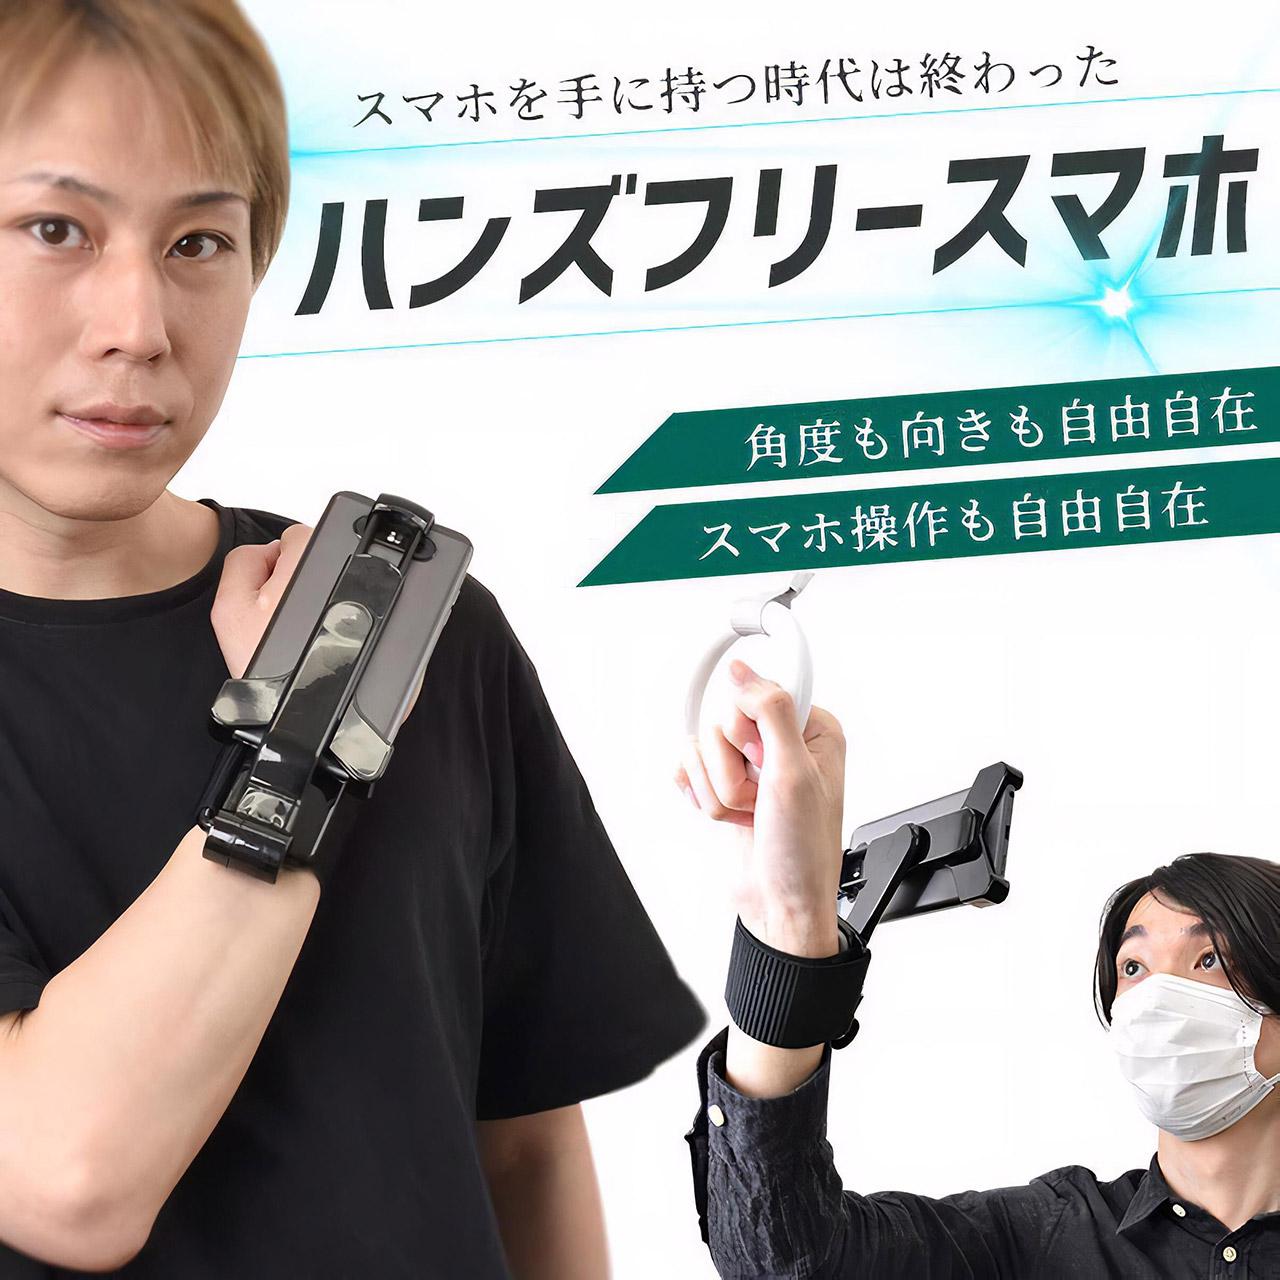 Thanko Smartphone Arm Mount